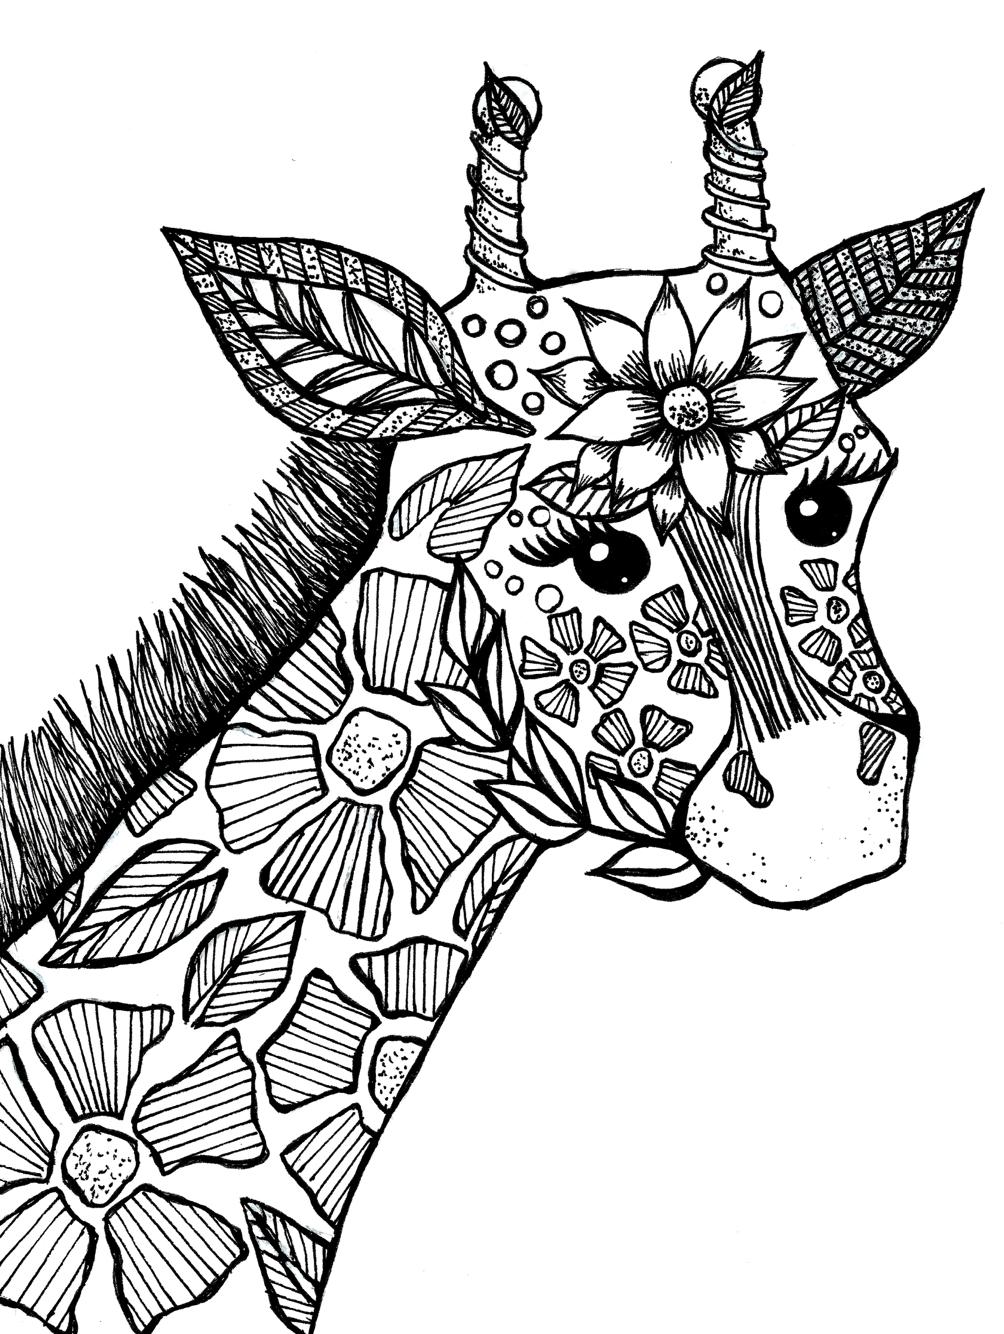 how to draw a giraffe head